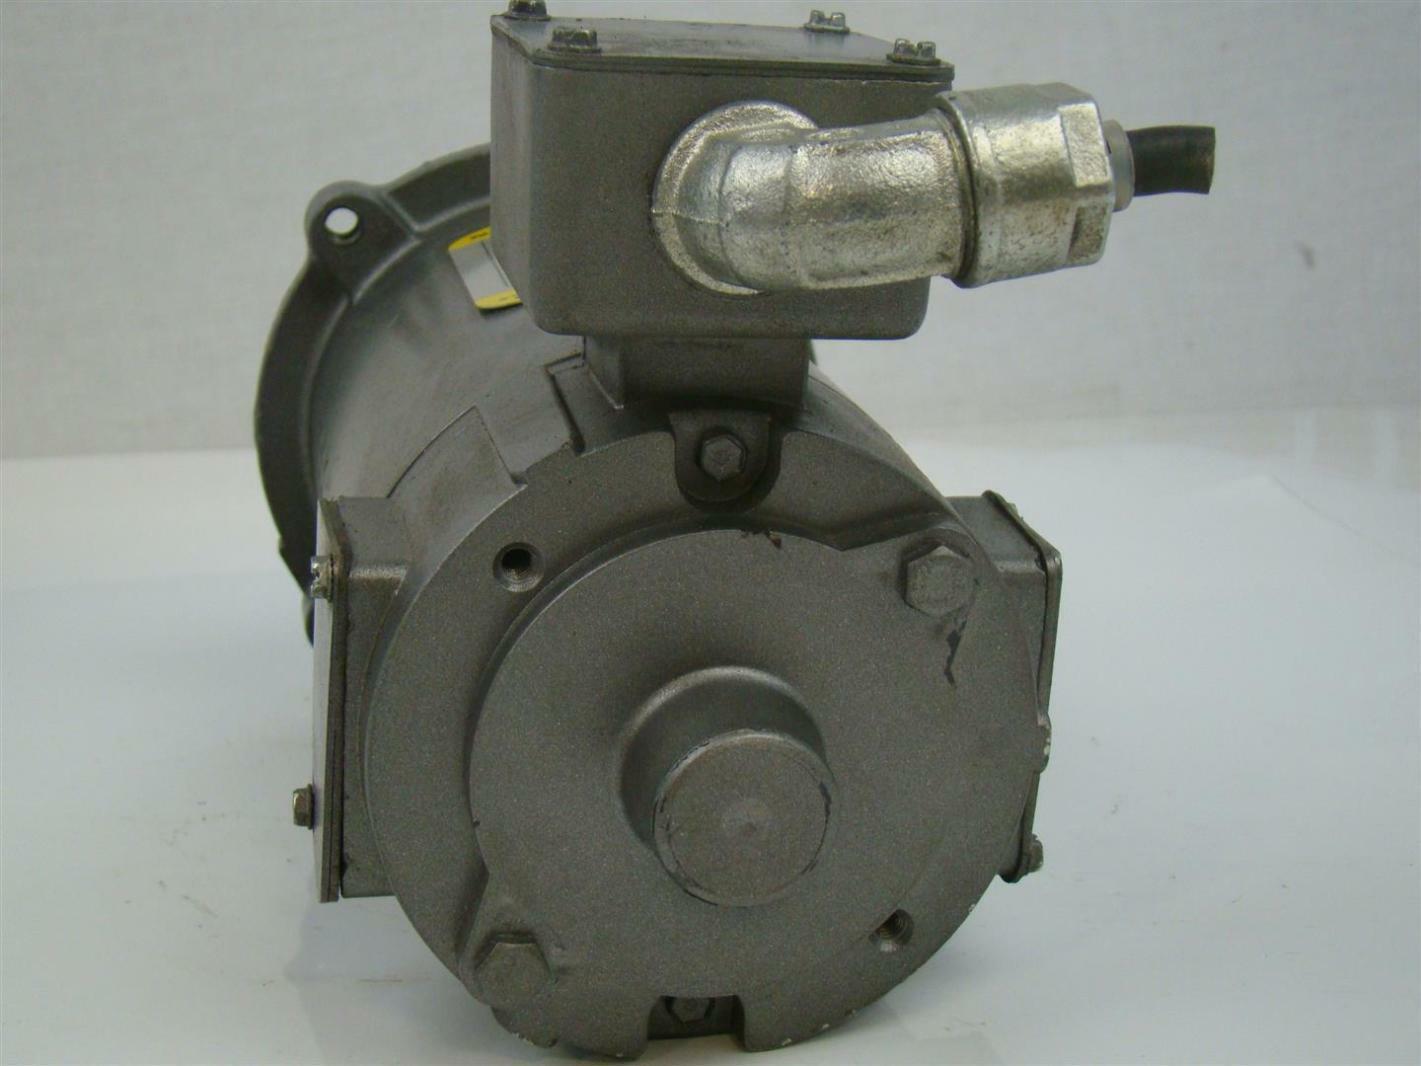 Baldor industrial dc motor 25hp 1750rpm 2 5a gdp3310 Baldor industrial motor pump